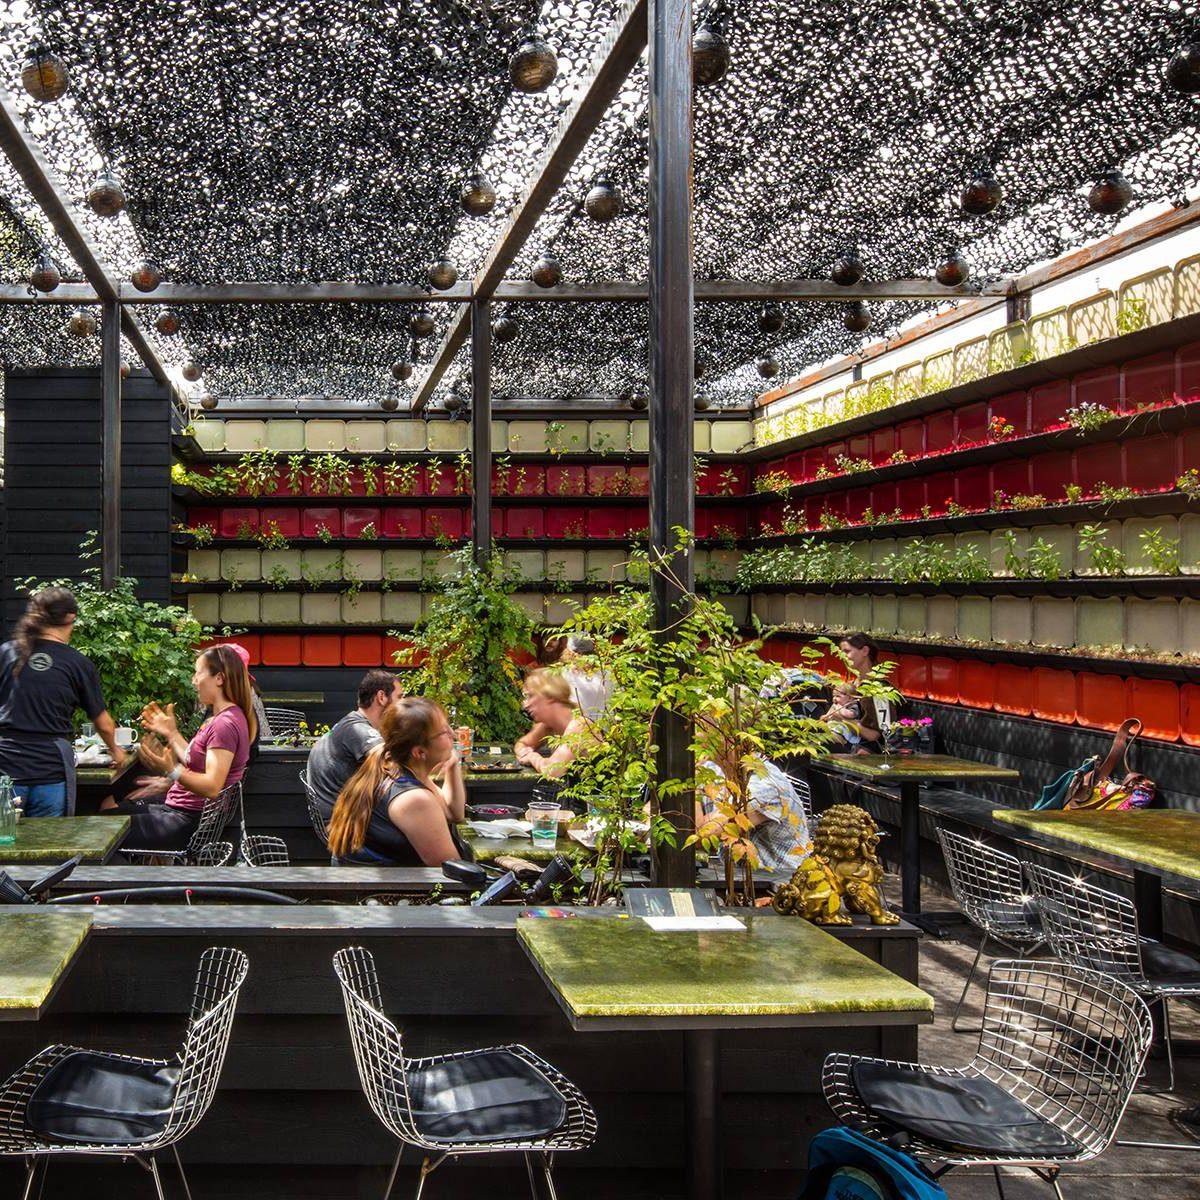 The best vegetarian/vegan cafe in Colorado